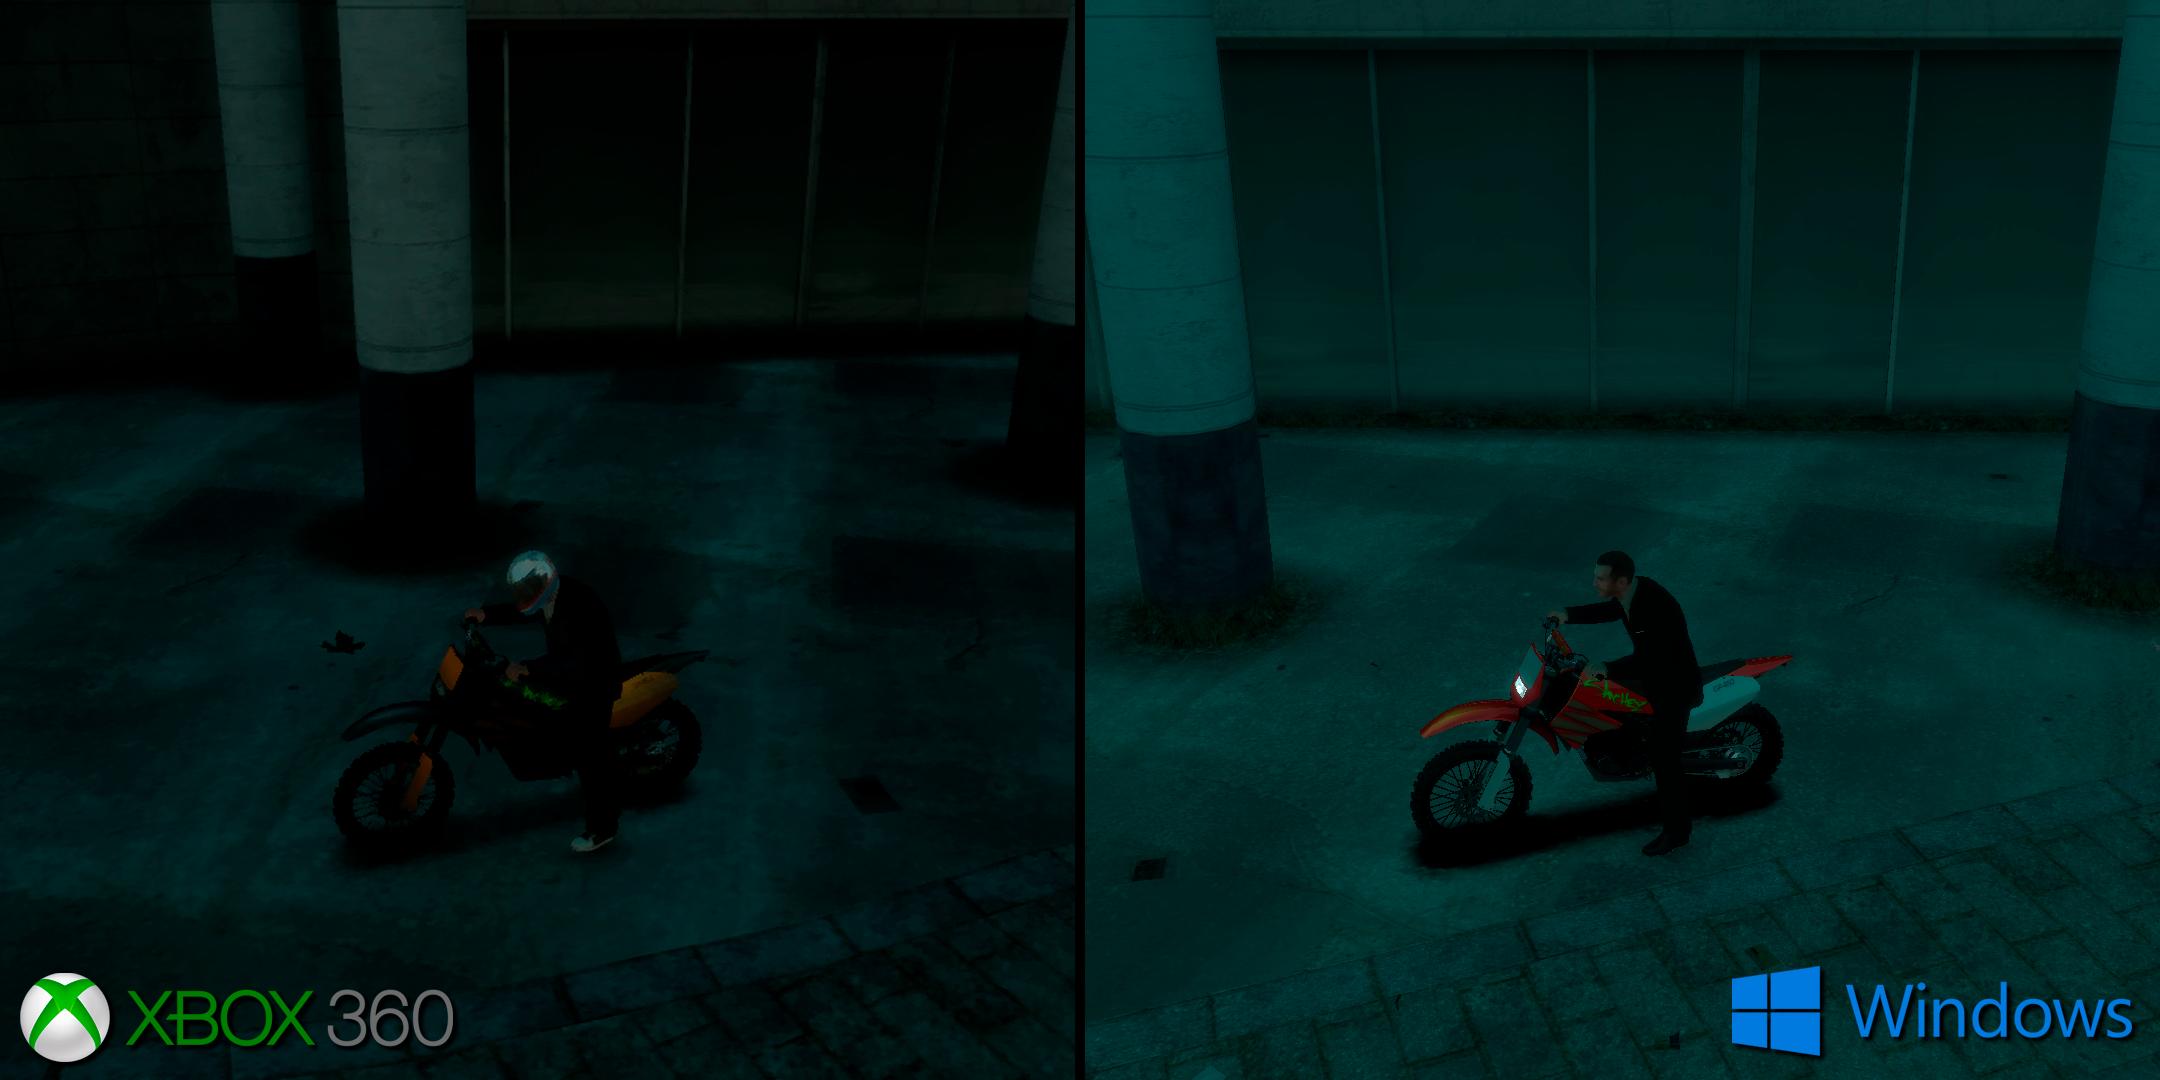 1592772617_shadow_headlight.png